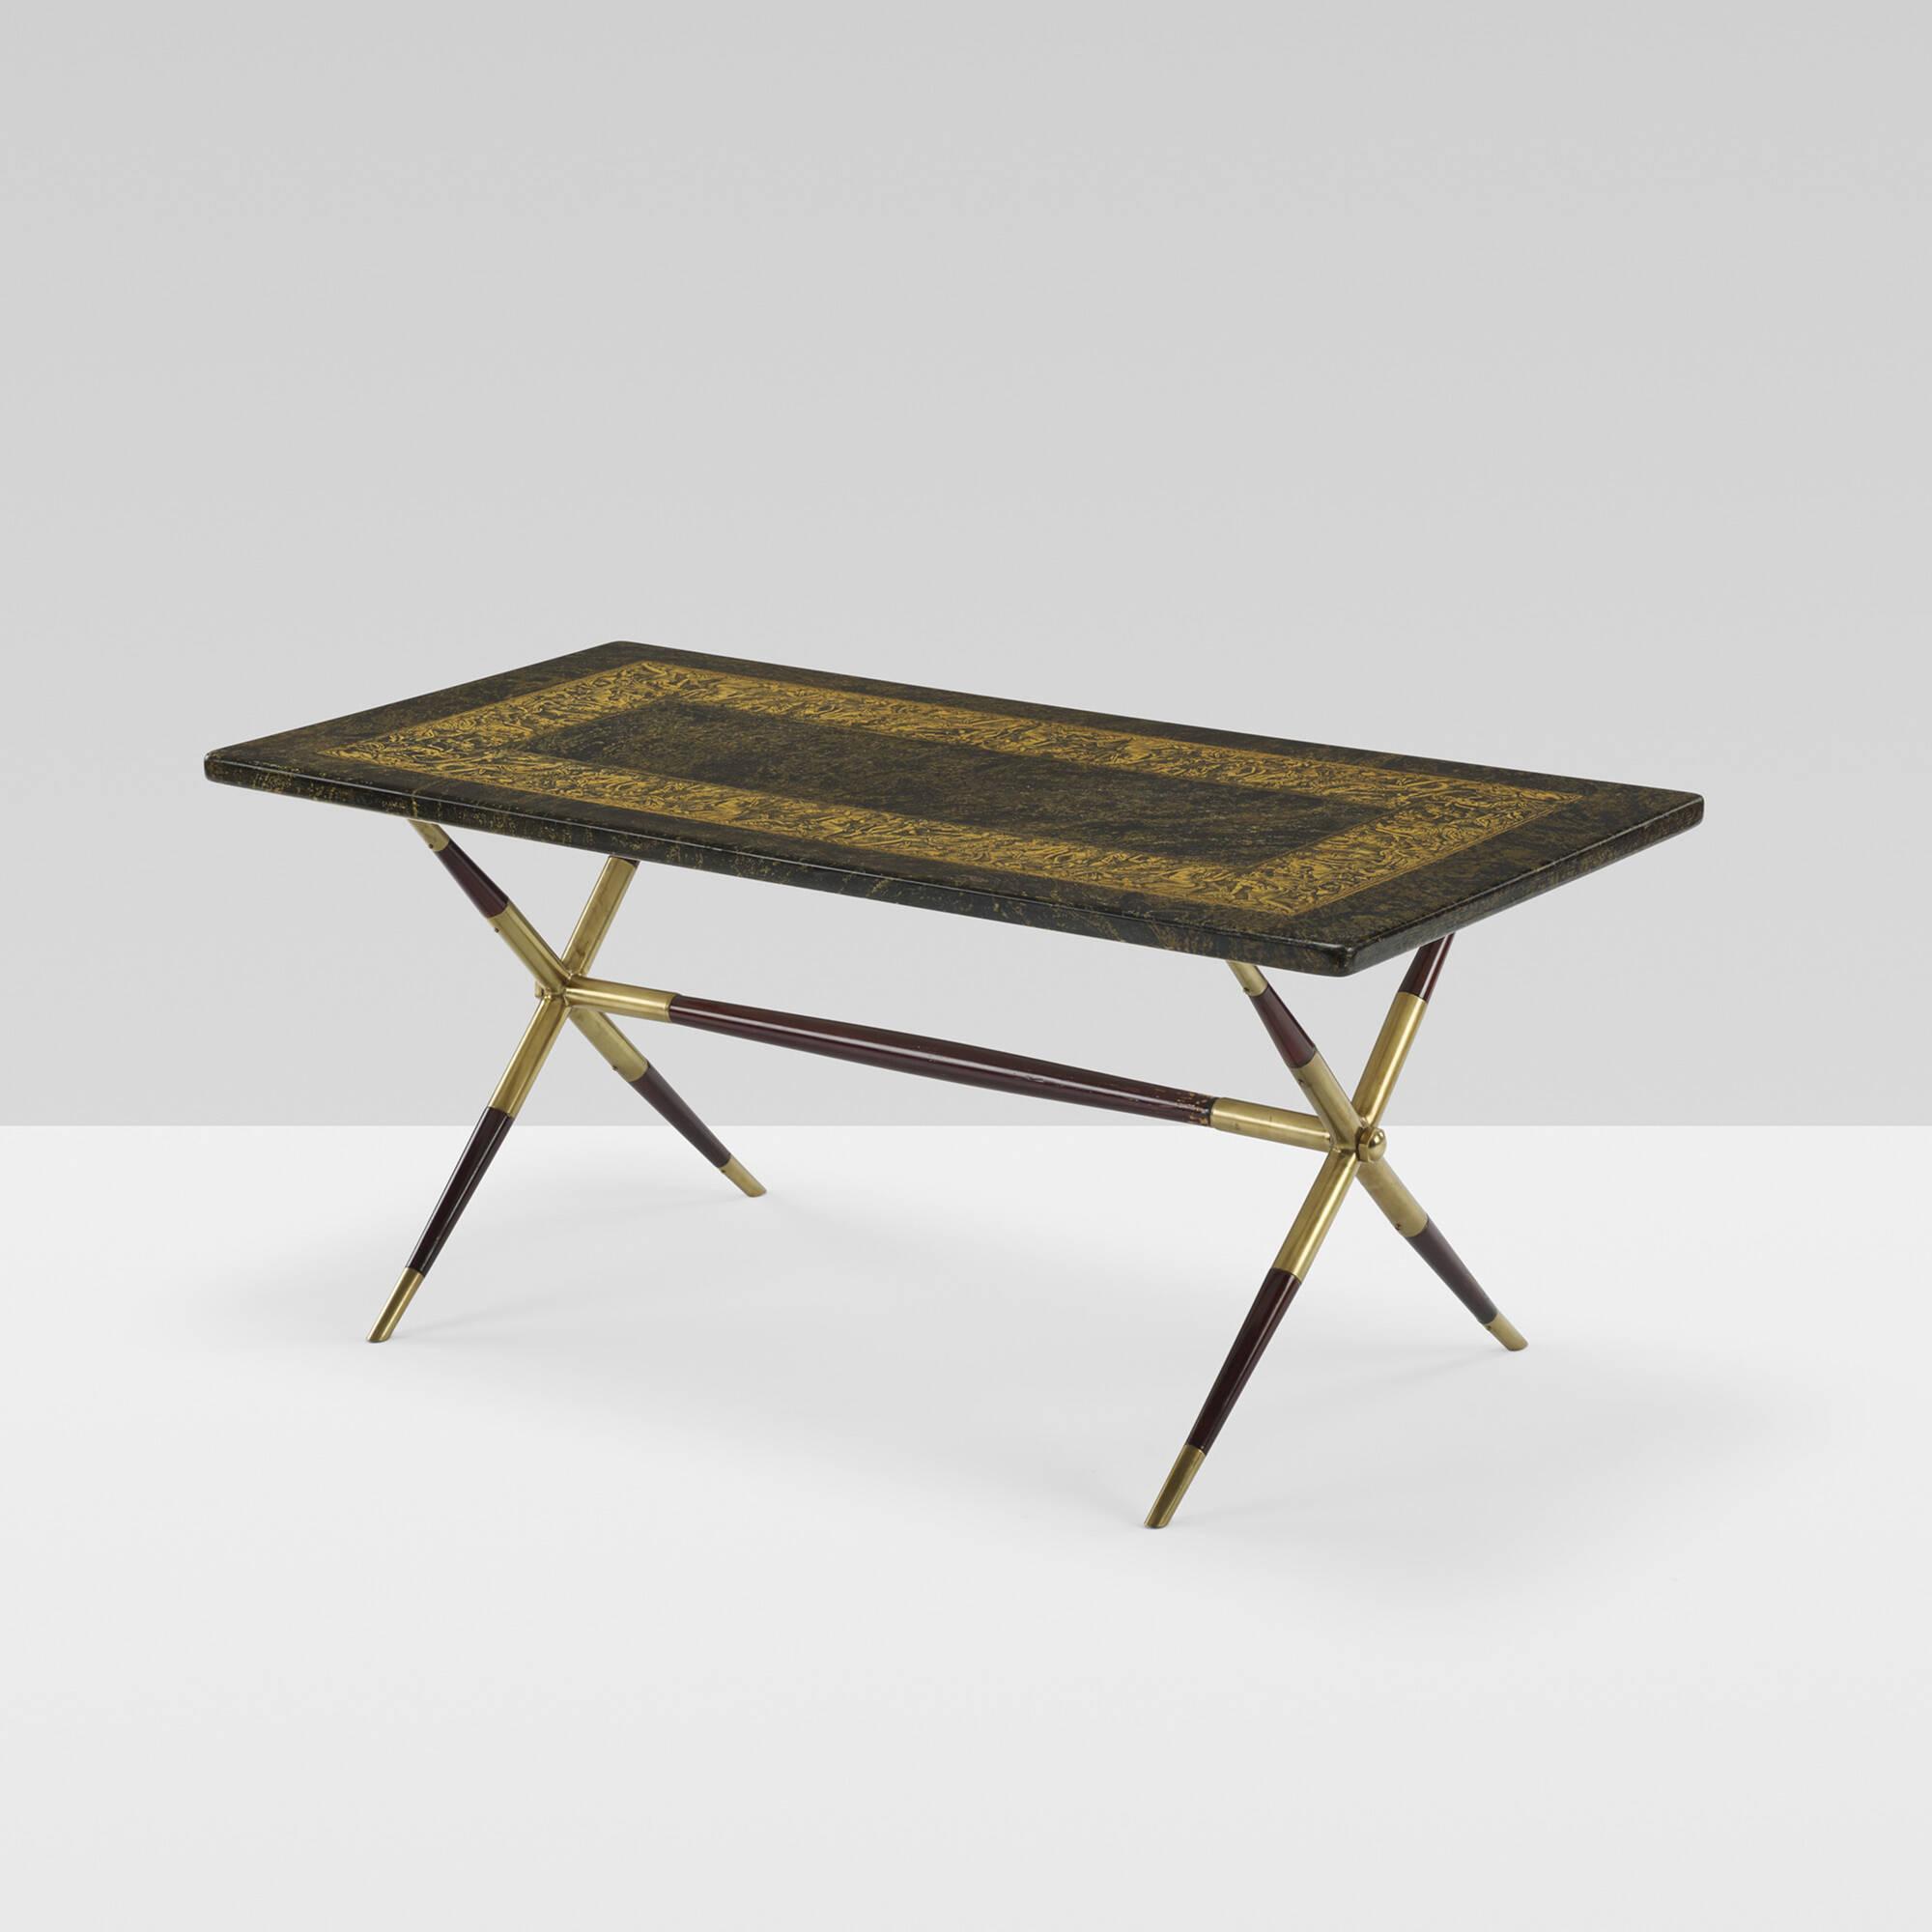 230: Piero Fornasetti / Bordo Bassorilievo Coffee Table (1 Of 4)